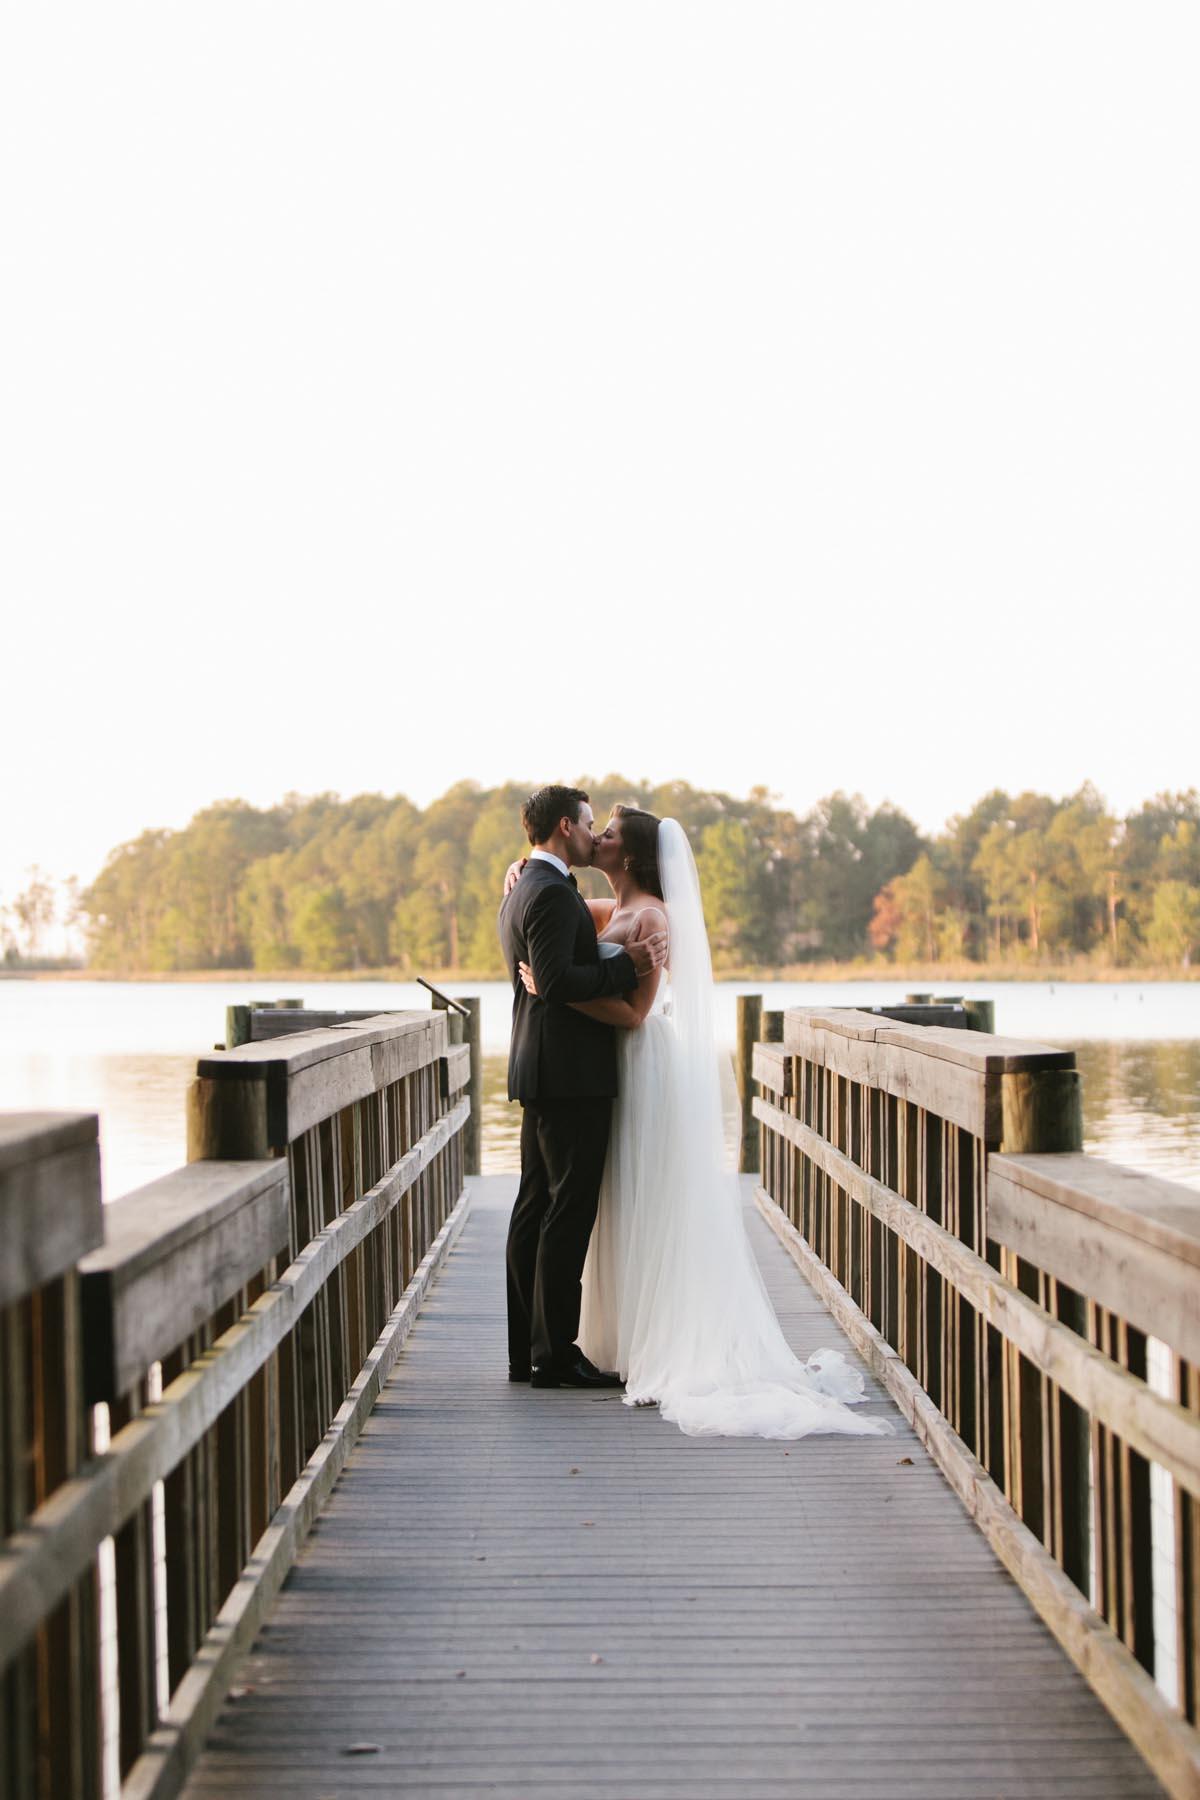 lowry wedding blog eden garden florida wedding-108